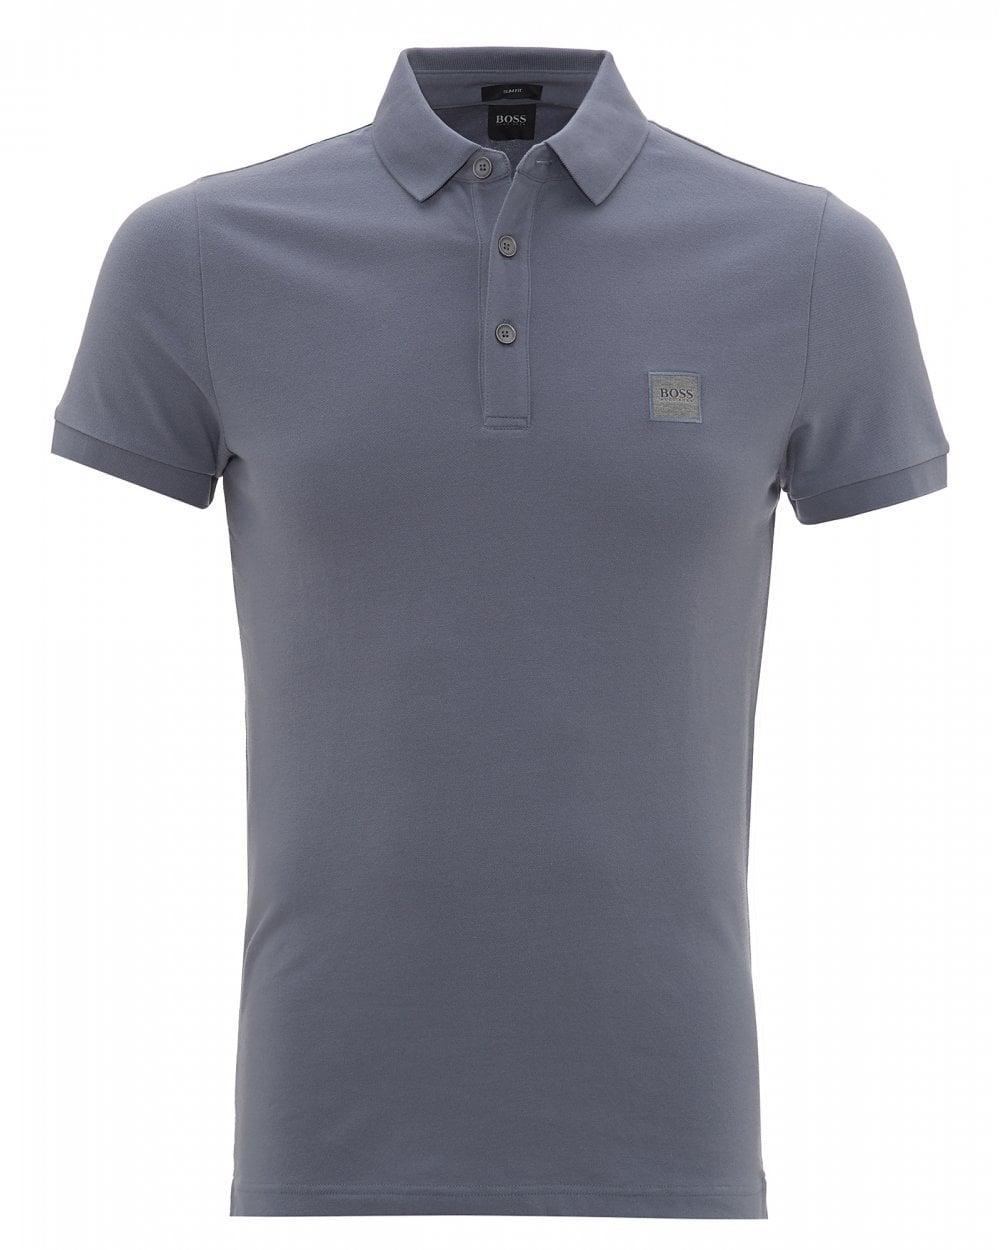 560d3f26 BOSS Casual Mens Passenger Polo Shirt, Open Blue Polo